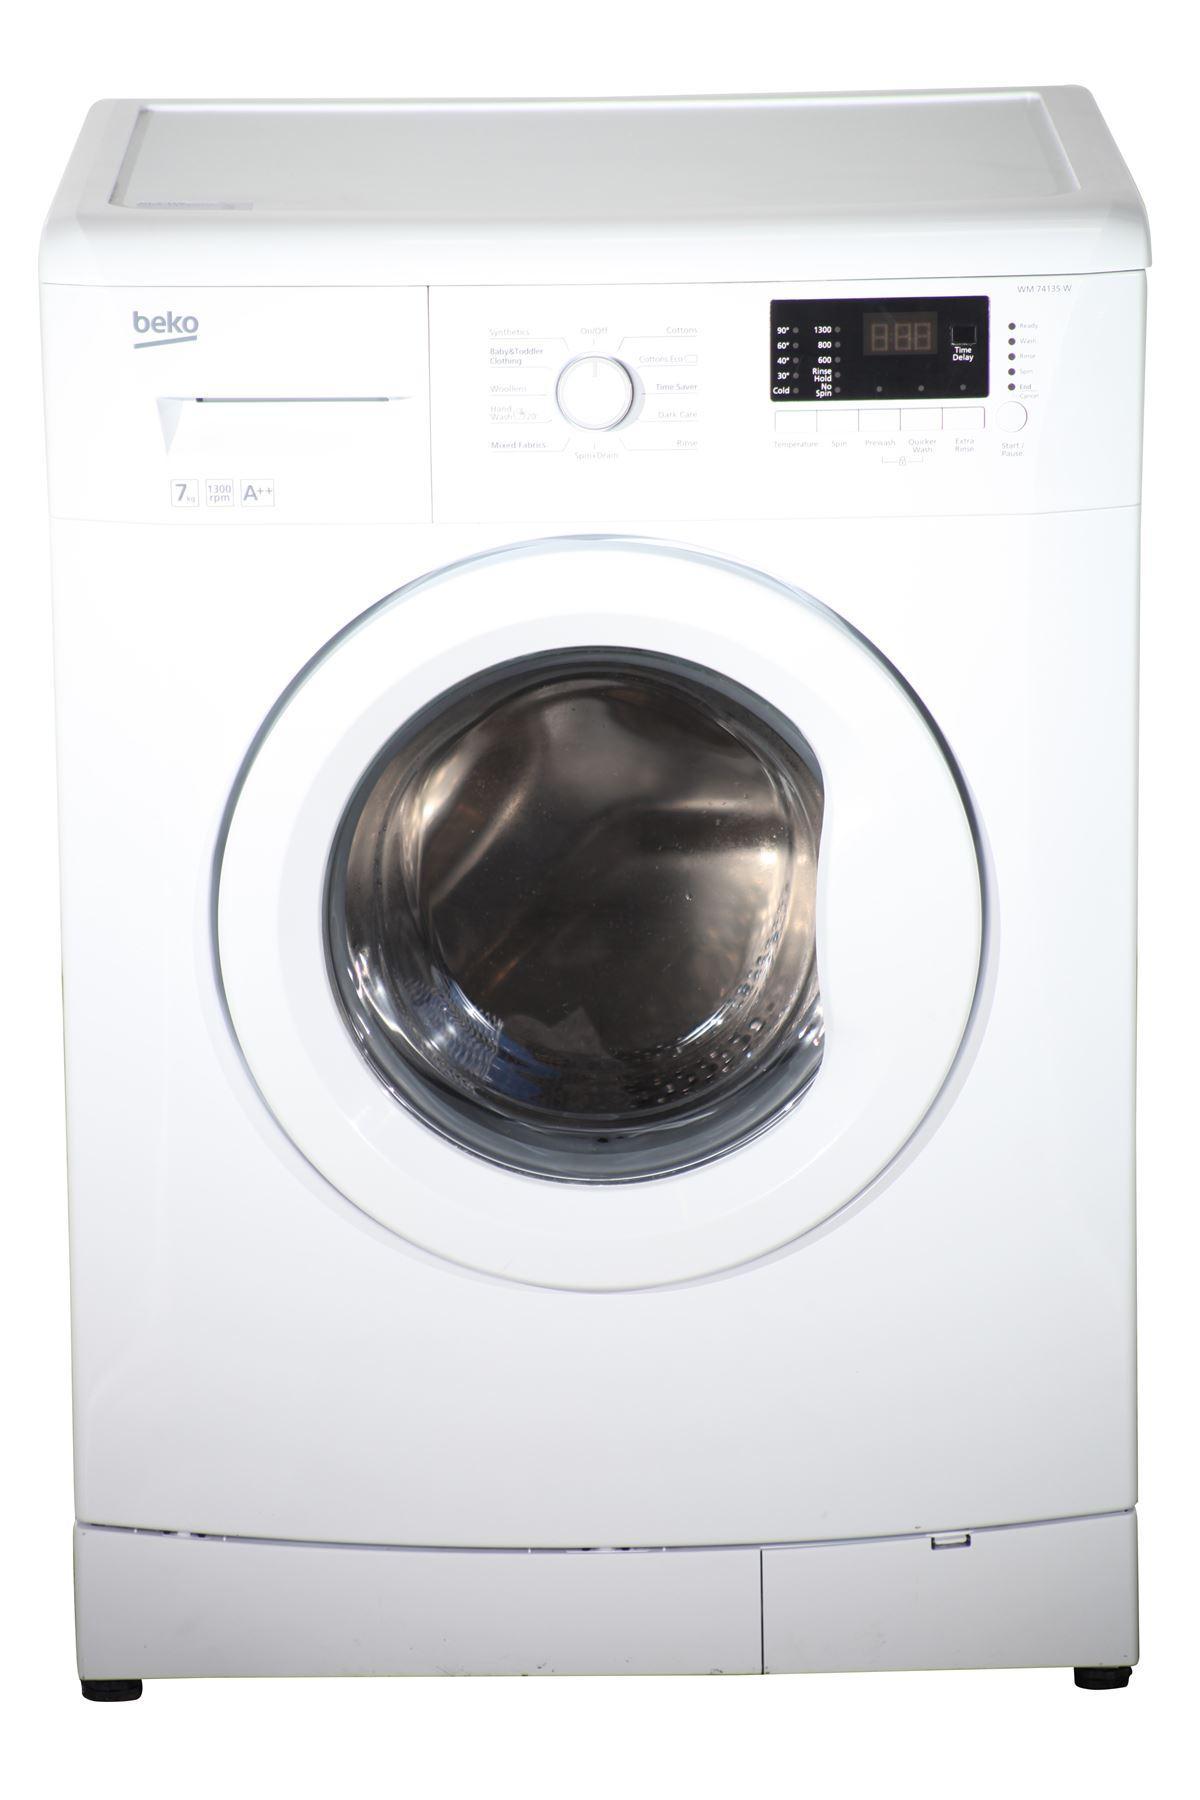 beko 7kg washing machine 1300 rpm wm74135w white. Black Bedroom Furniture Sets. Home Design Ideas